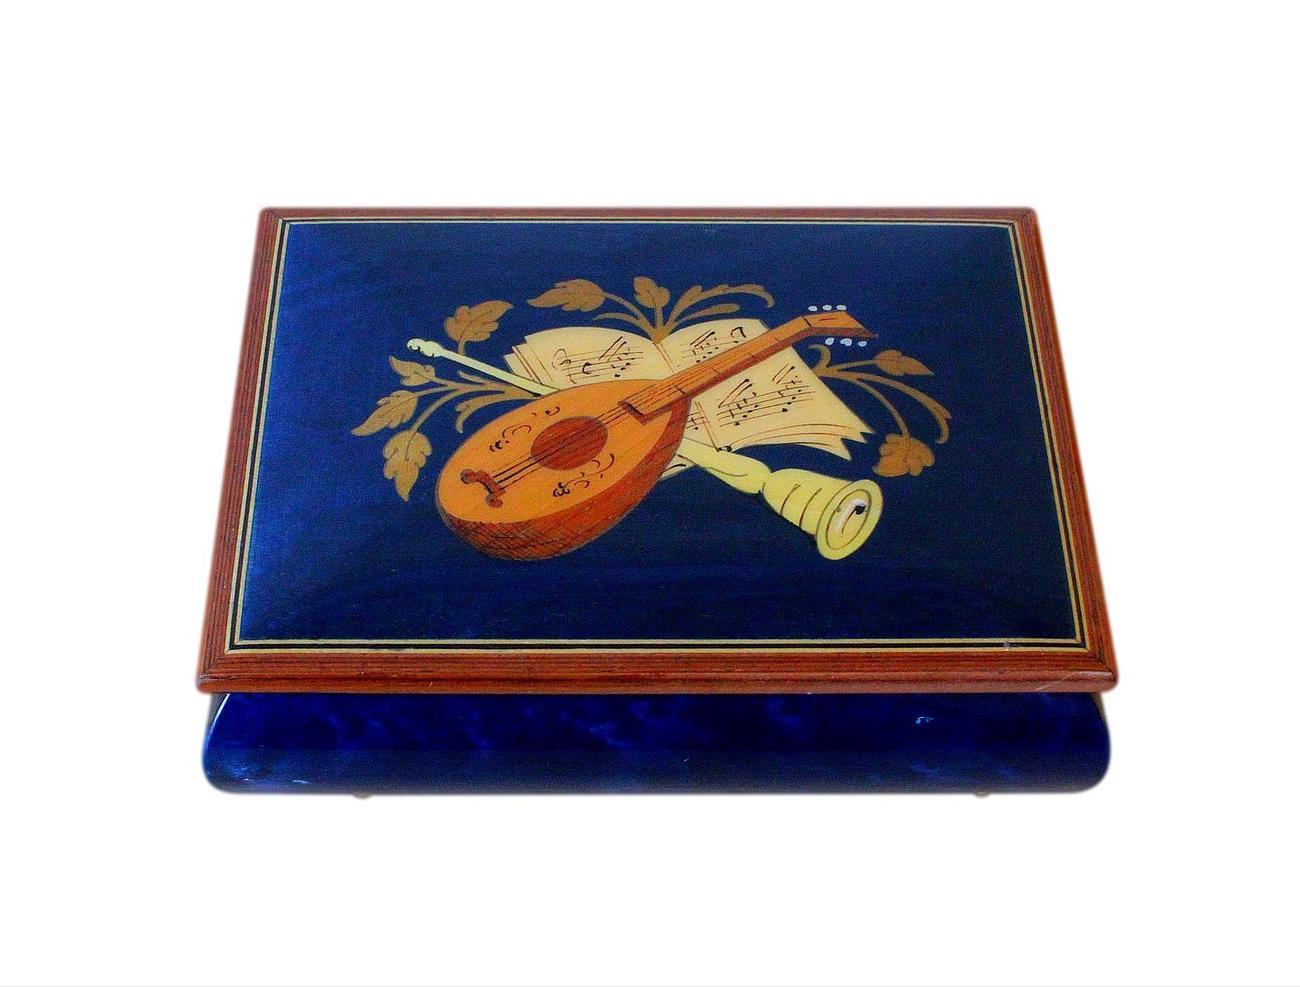 Enameled_Sorrento_Musical_Jewellery_Box.jpg